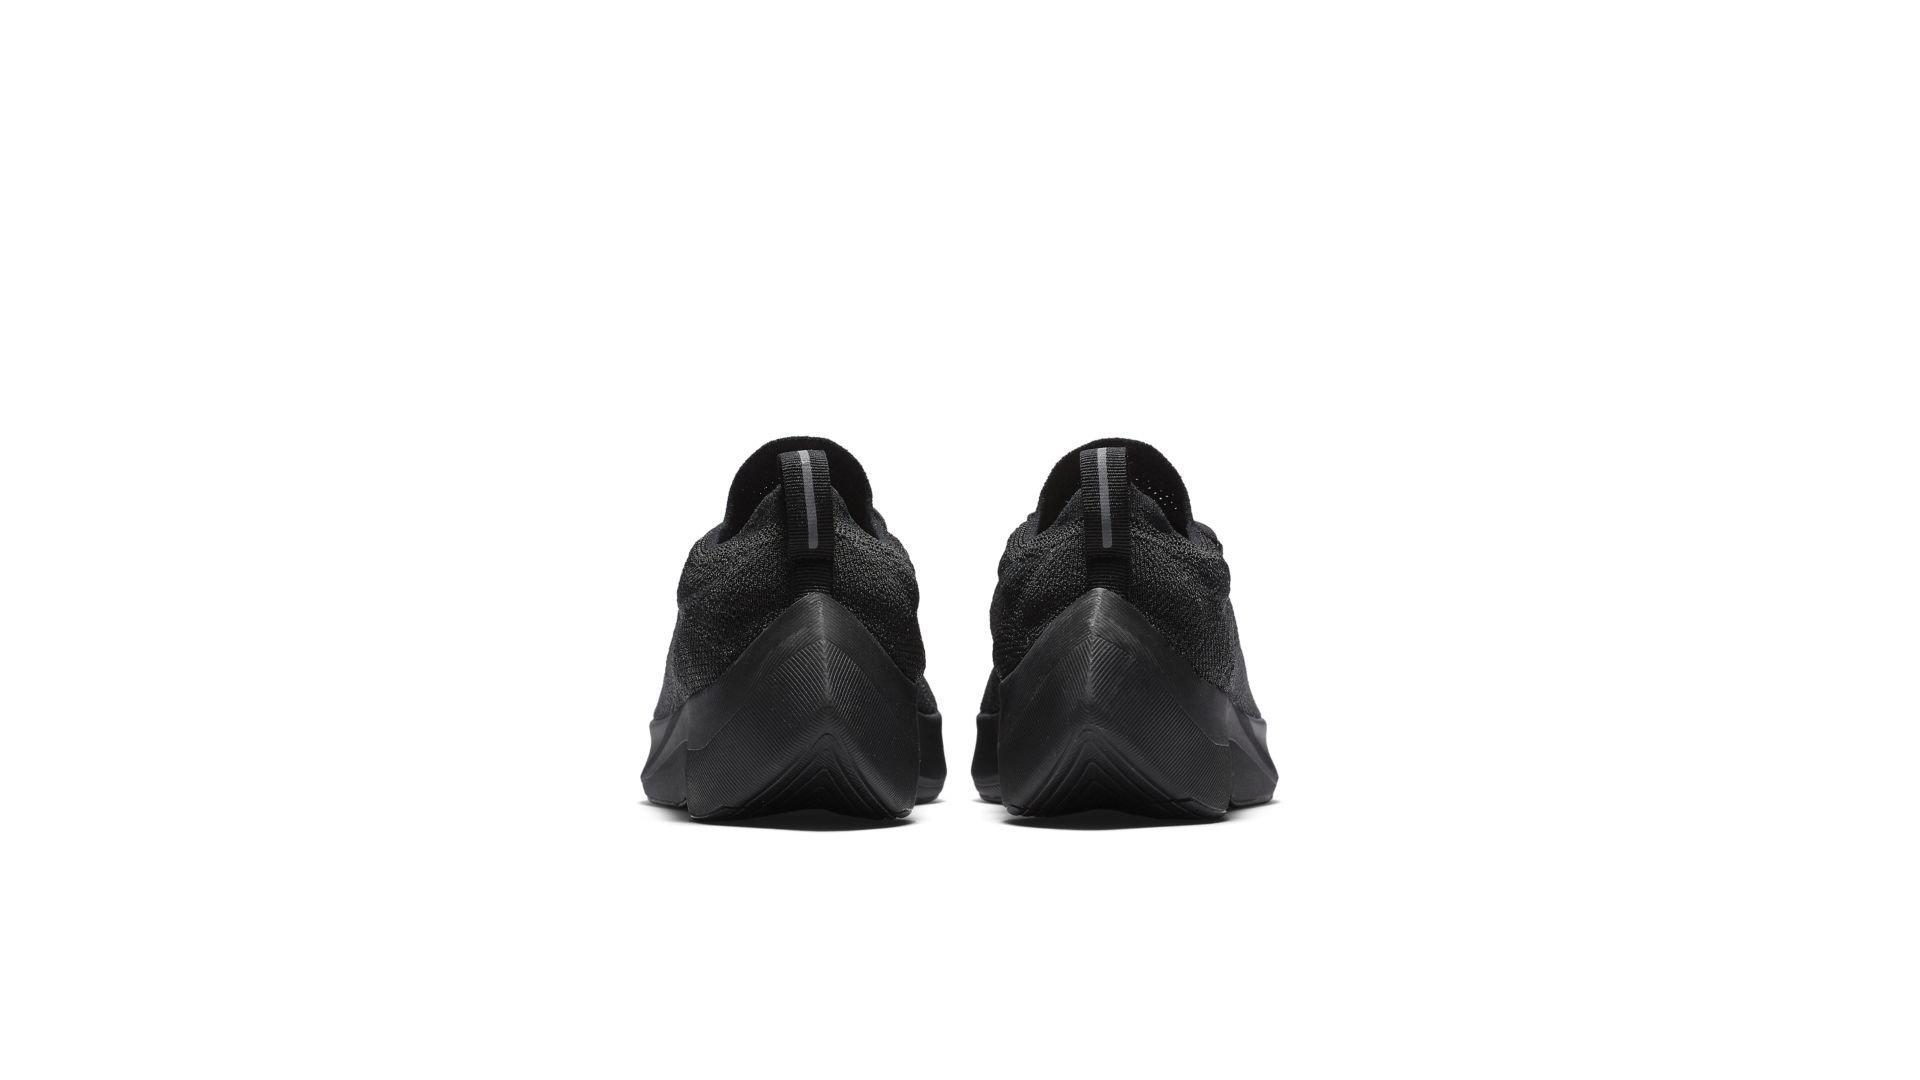 Nike Vapor Street Flyknit Black (AQ1763-001)